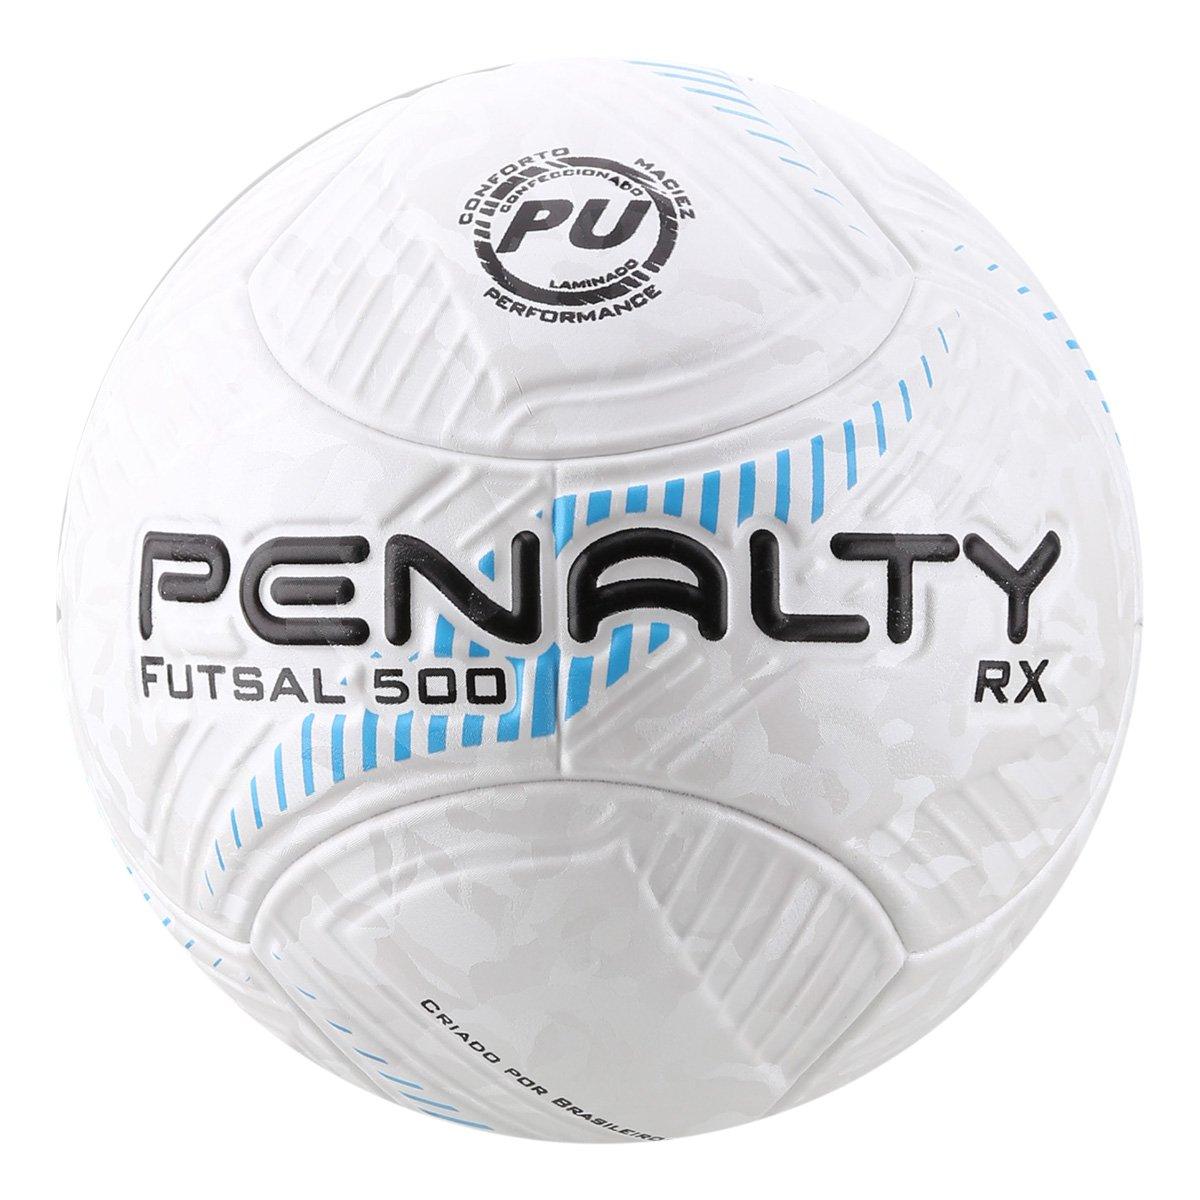 b6887b2b95 Bola Futsal Penalty Rx Fusion VIII